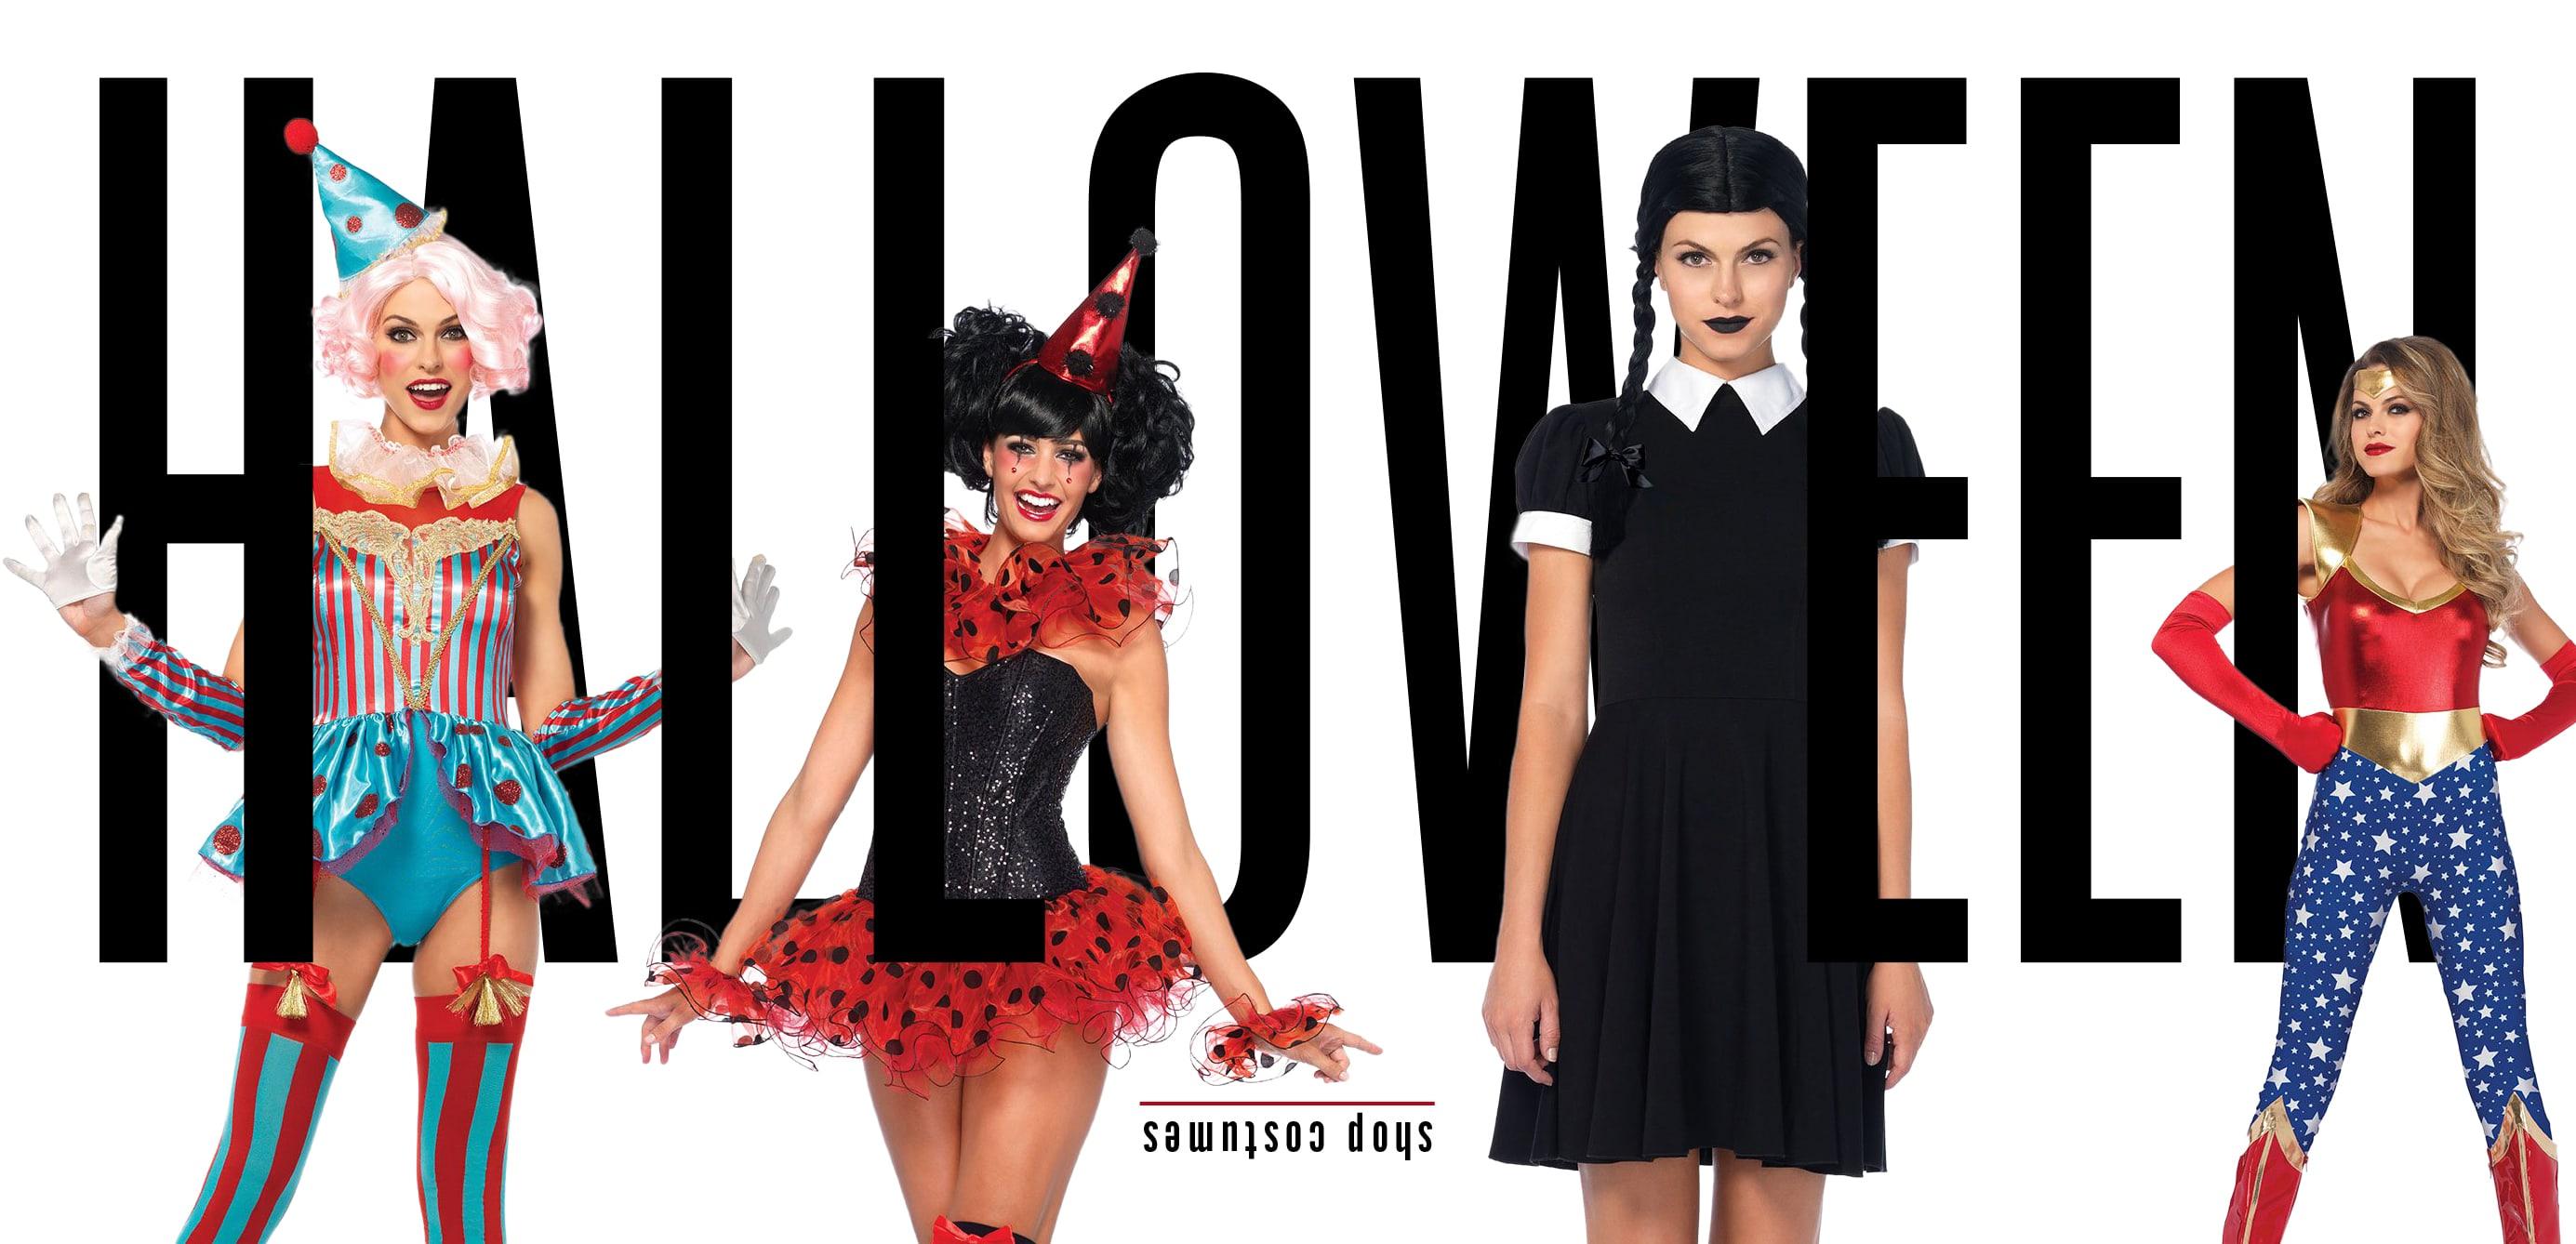 Costumes | Tiltedsole.com